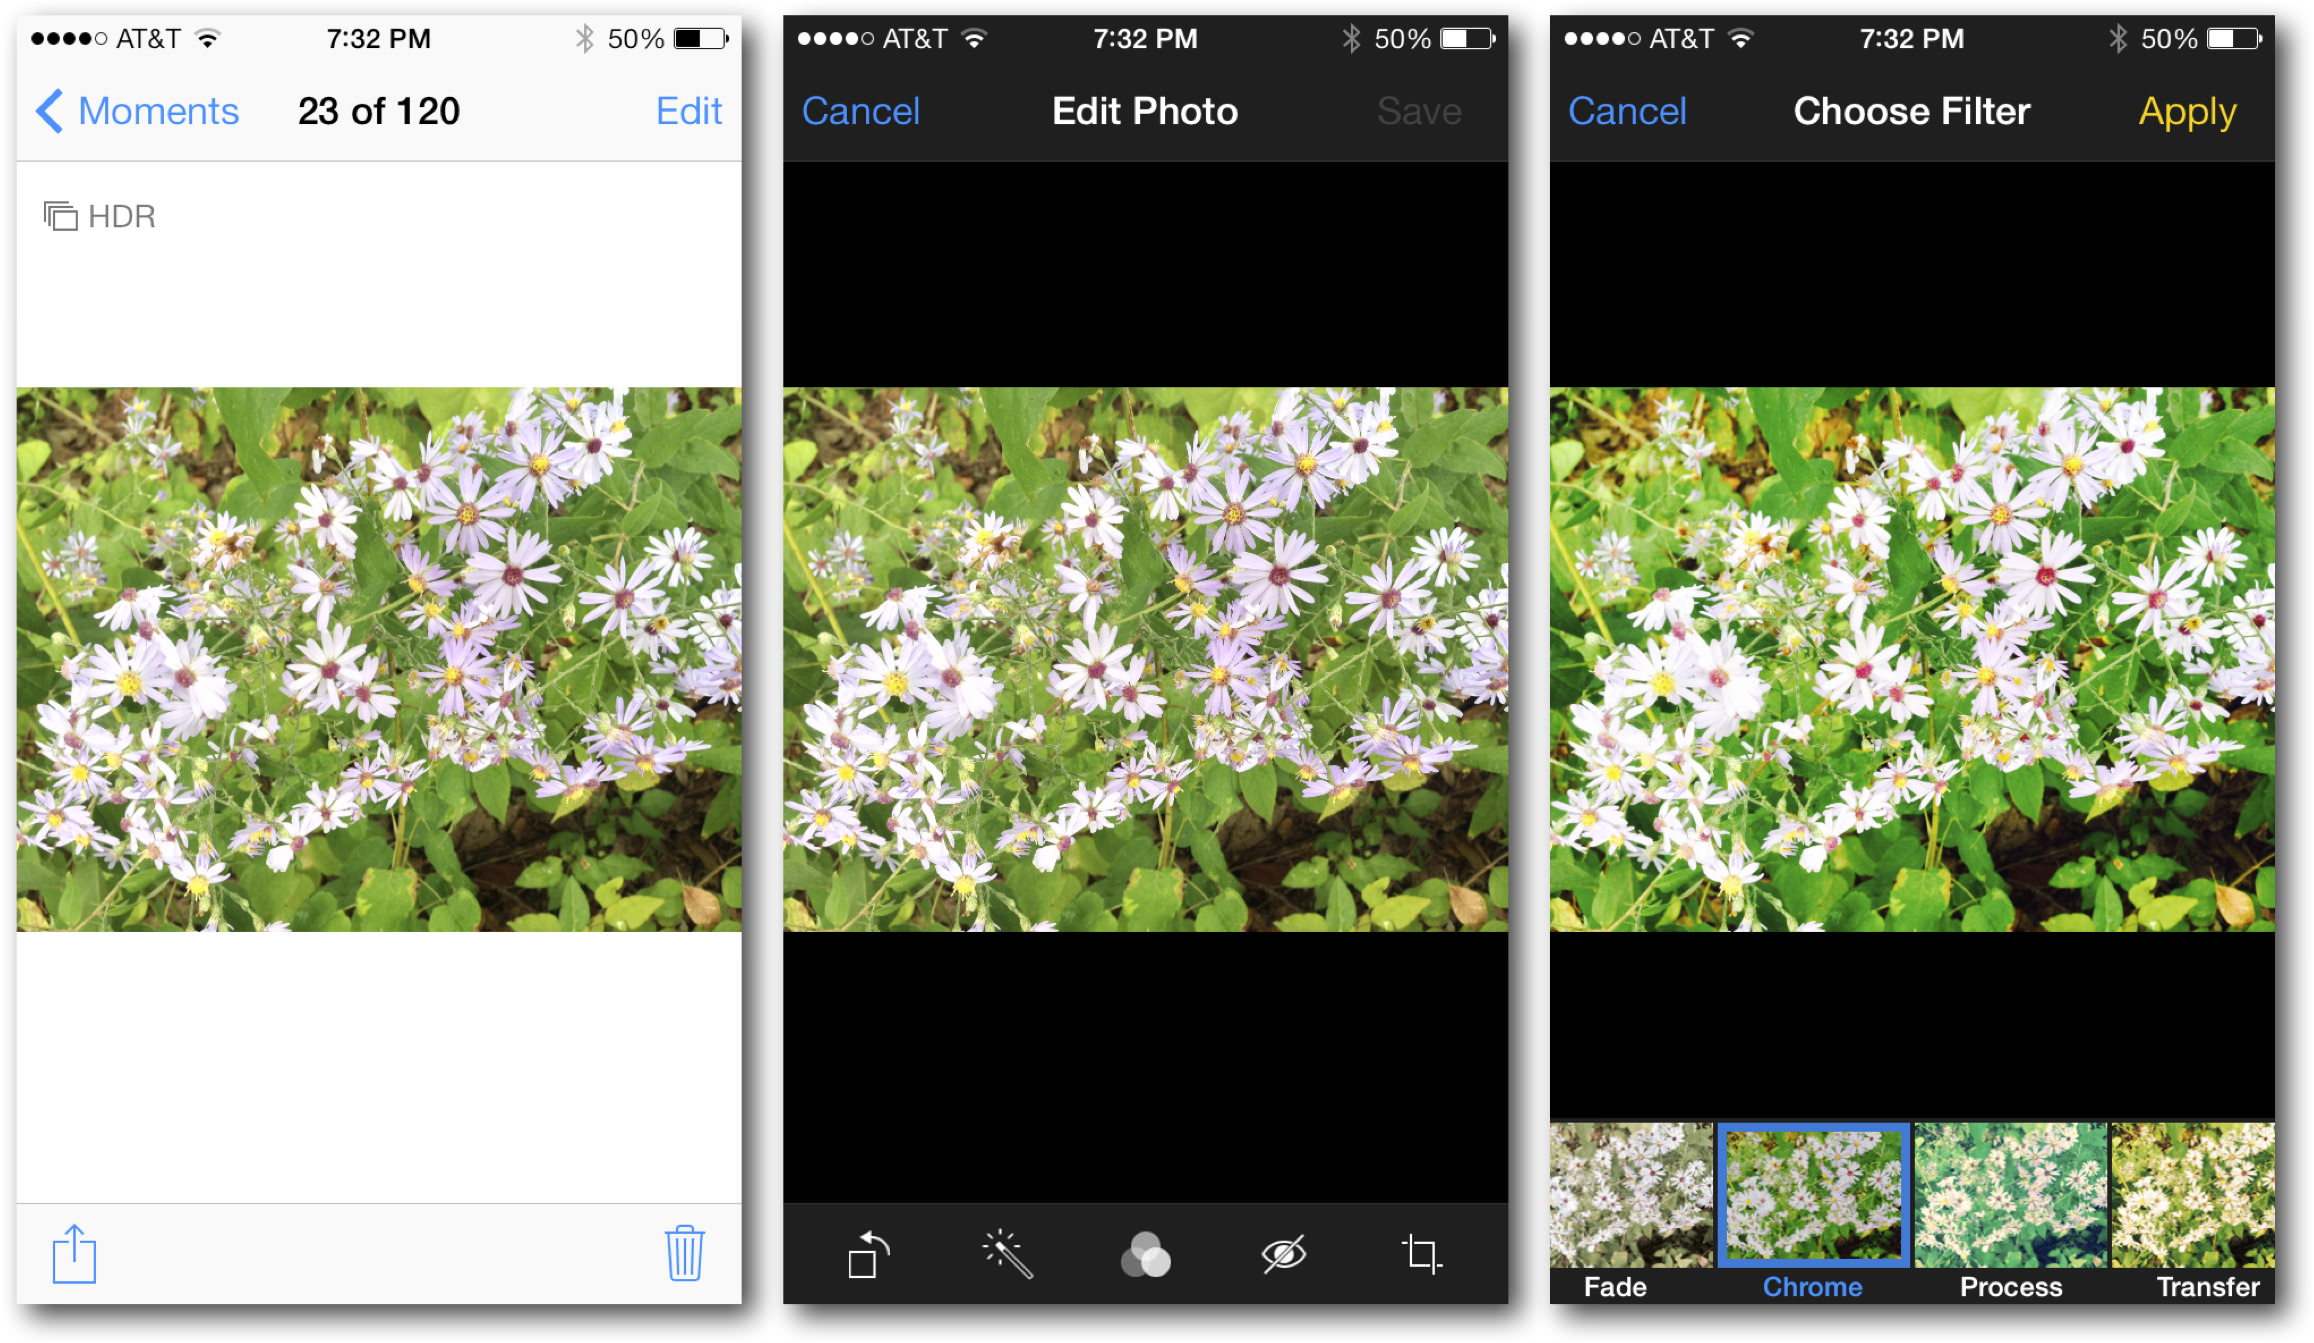 iOS 7 Photos Editing